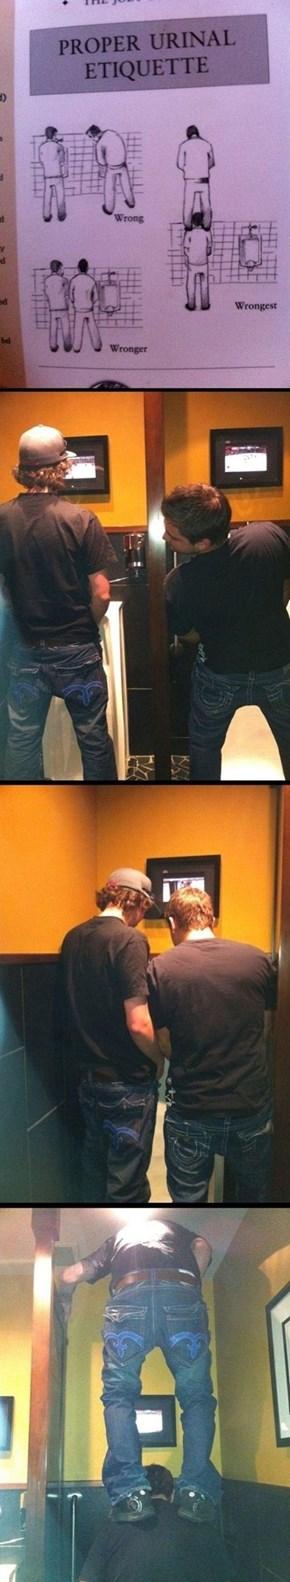 Always Follow Proper Urinal Etiquette